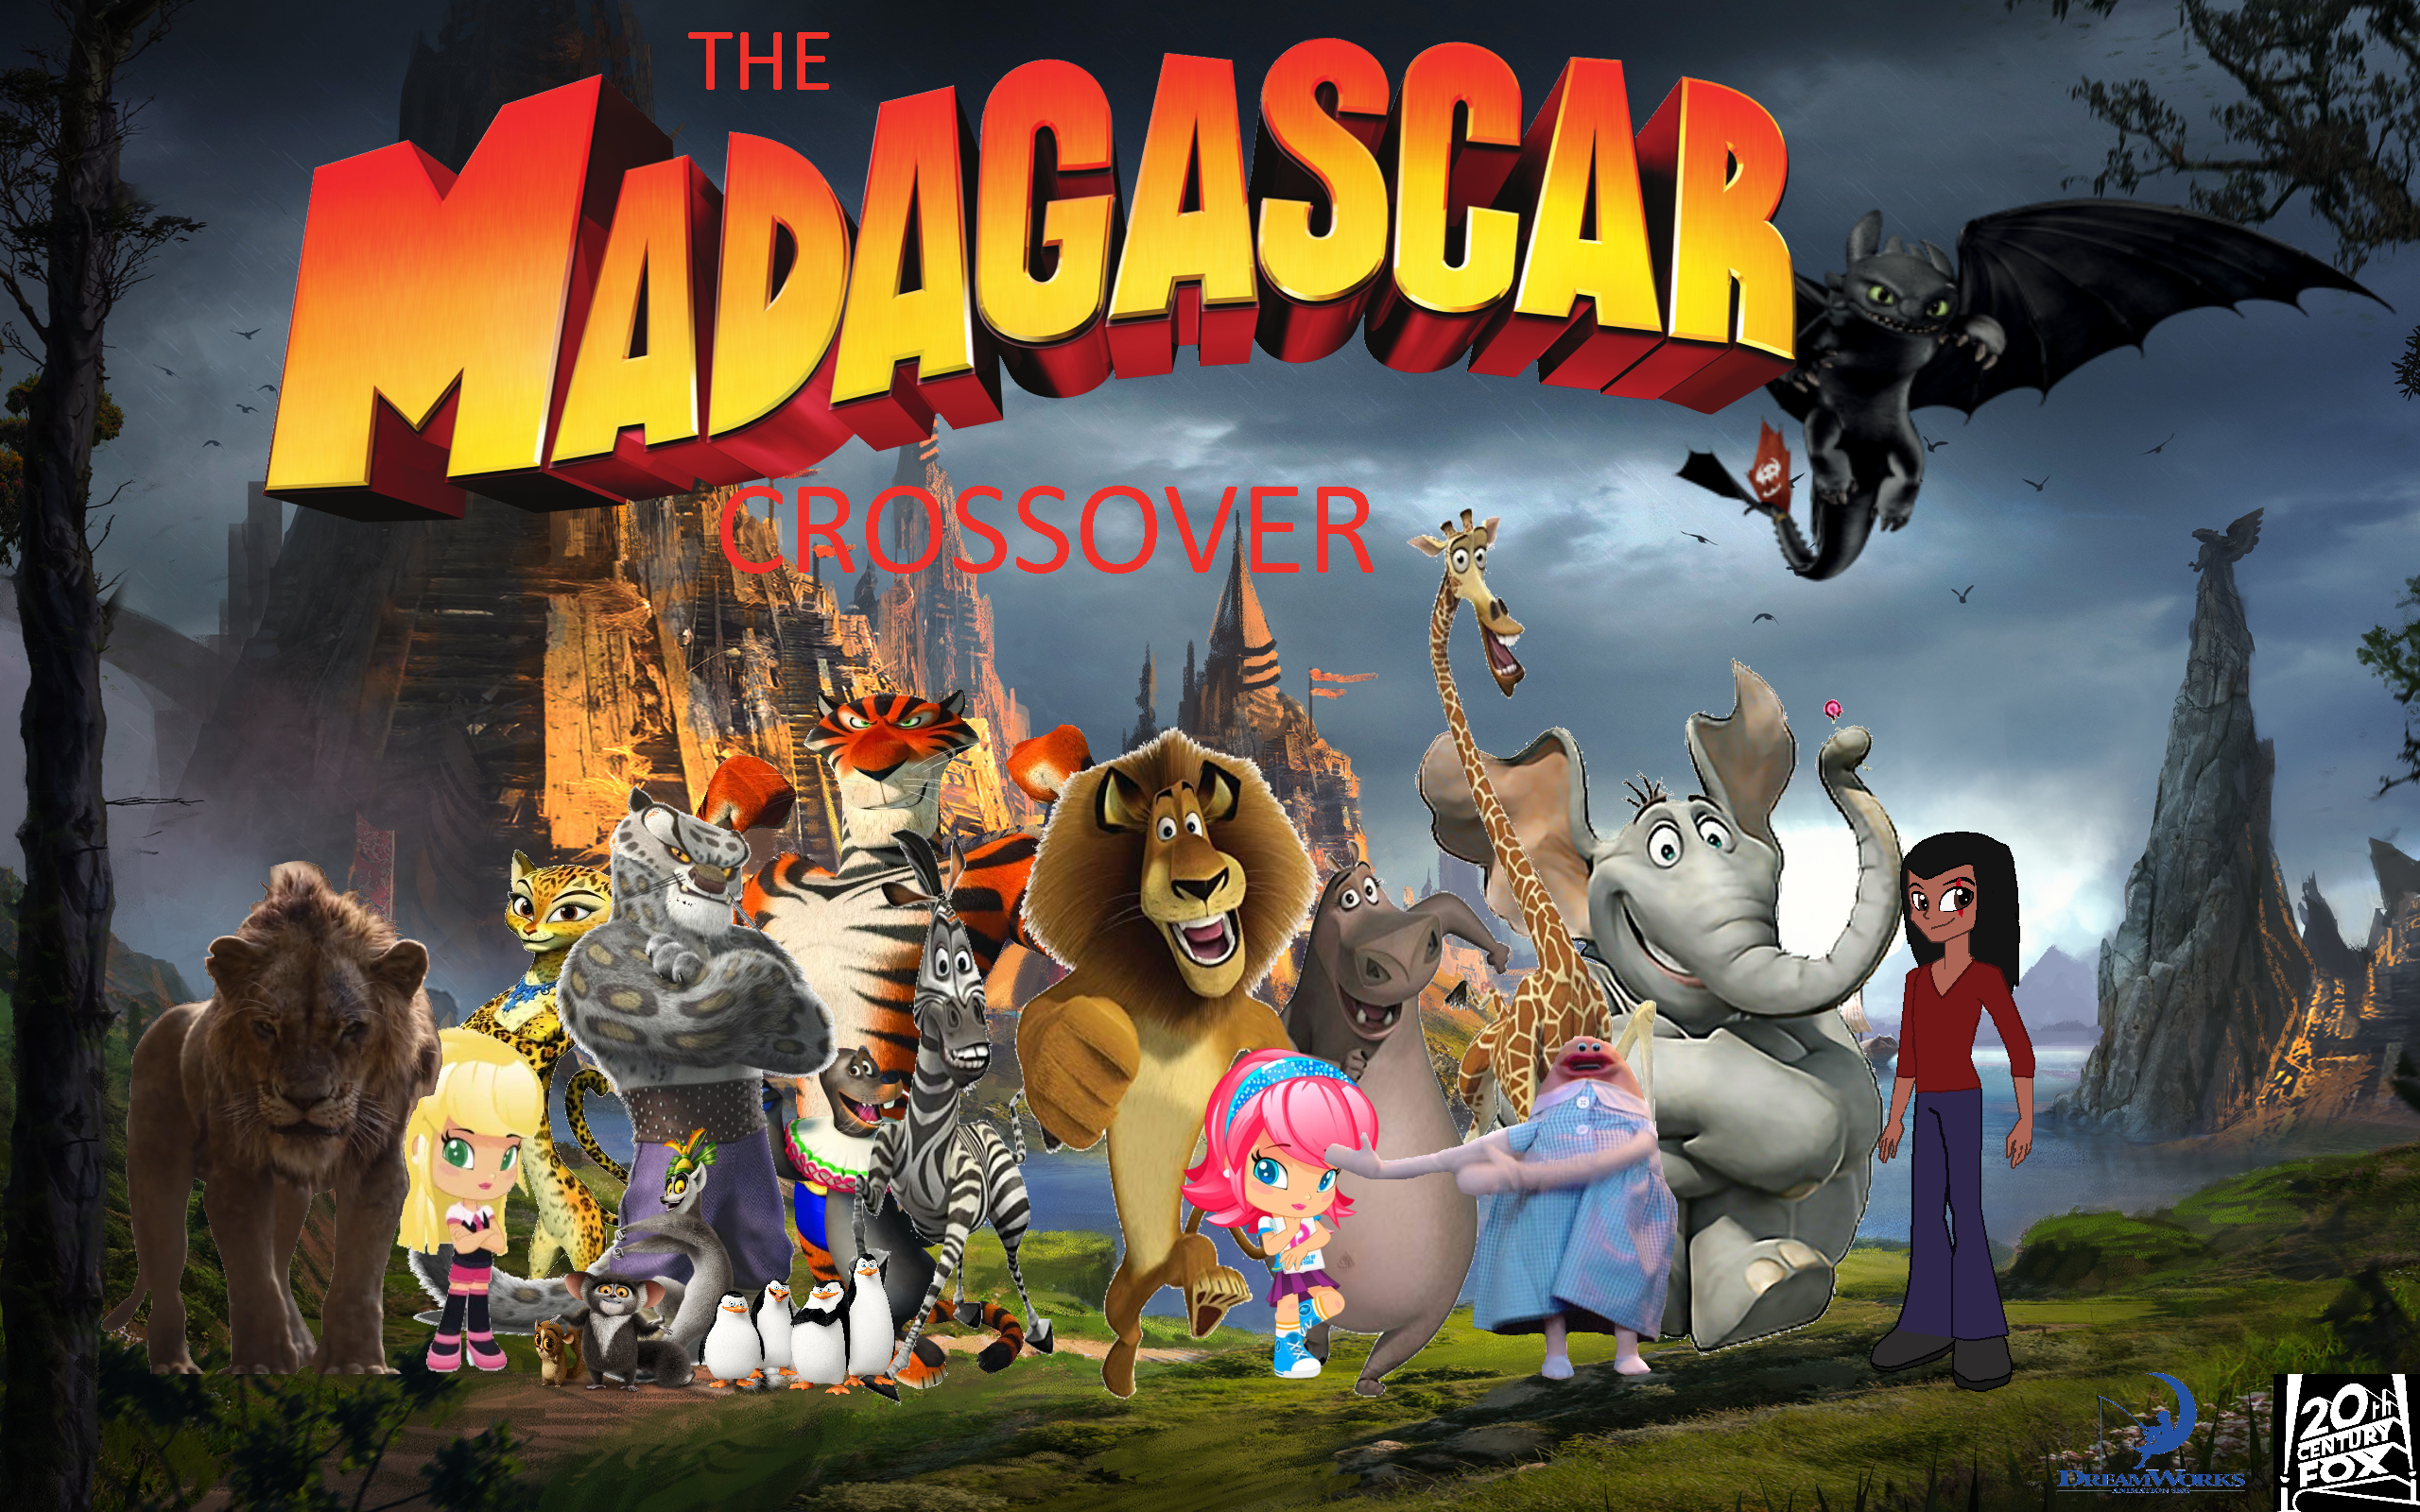 The Madagascar Crossover